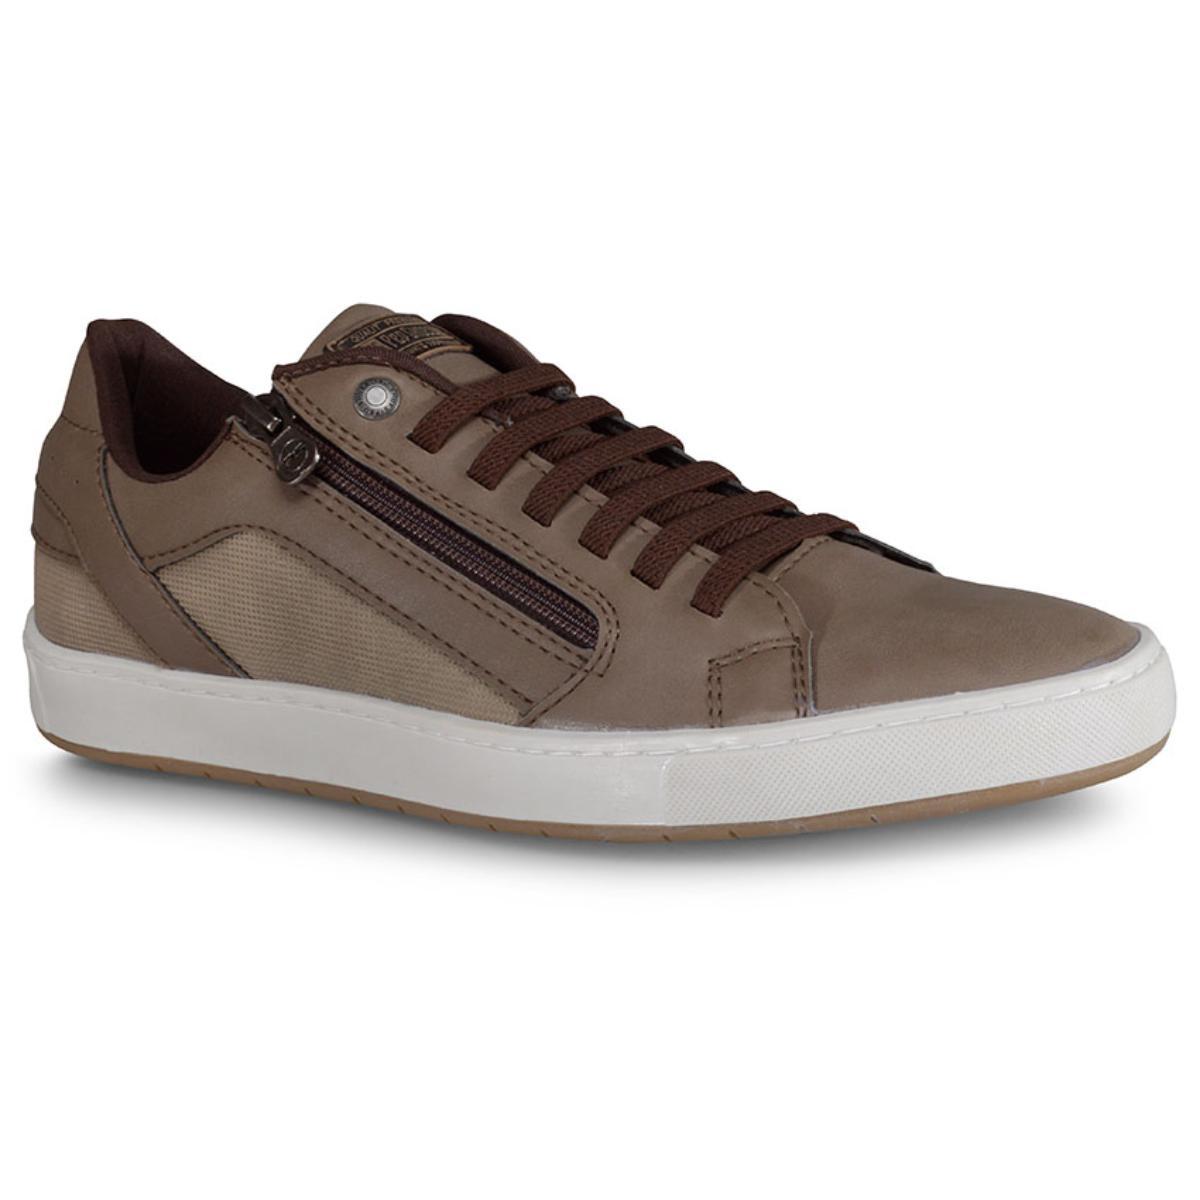 Sapatênis Masculino Ped Shoes 14041-e Rato Kit Cinto+meia